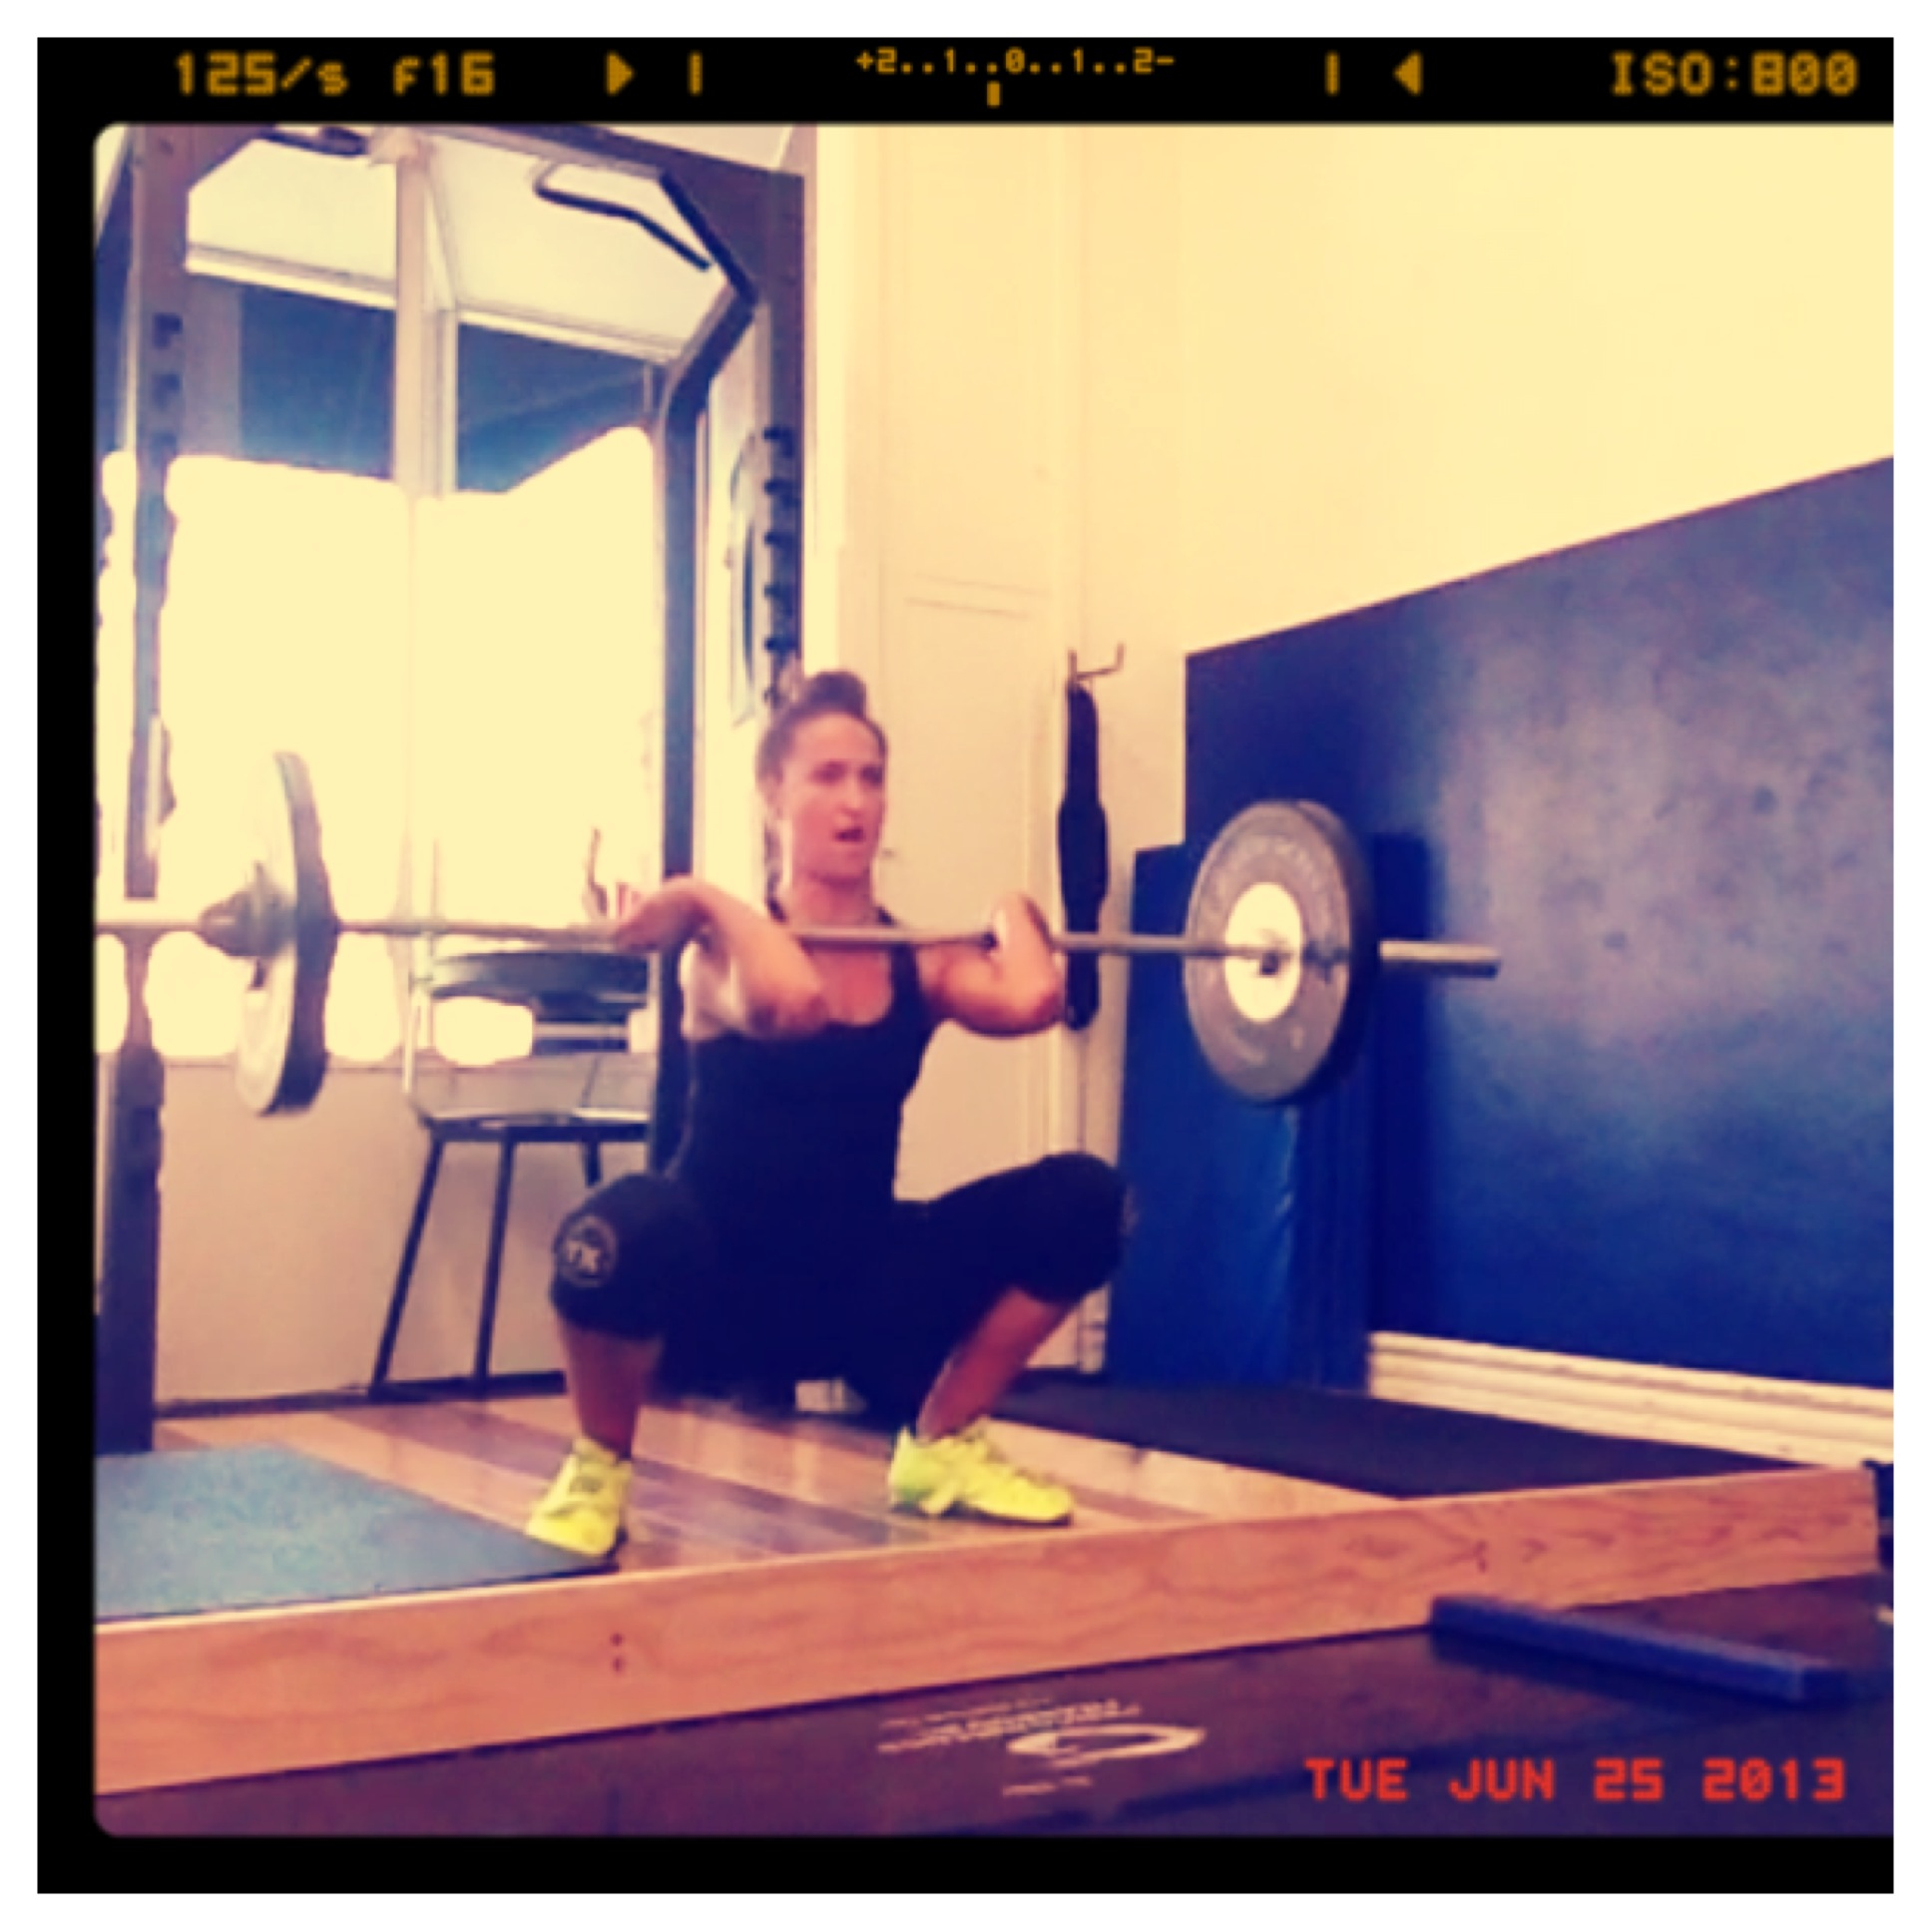 Kerri Lopez, Olympic Lifting training